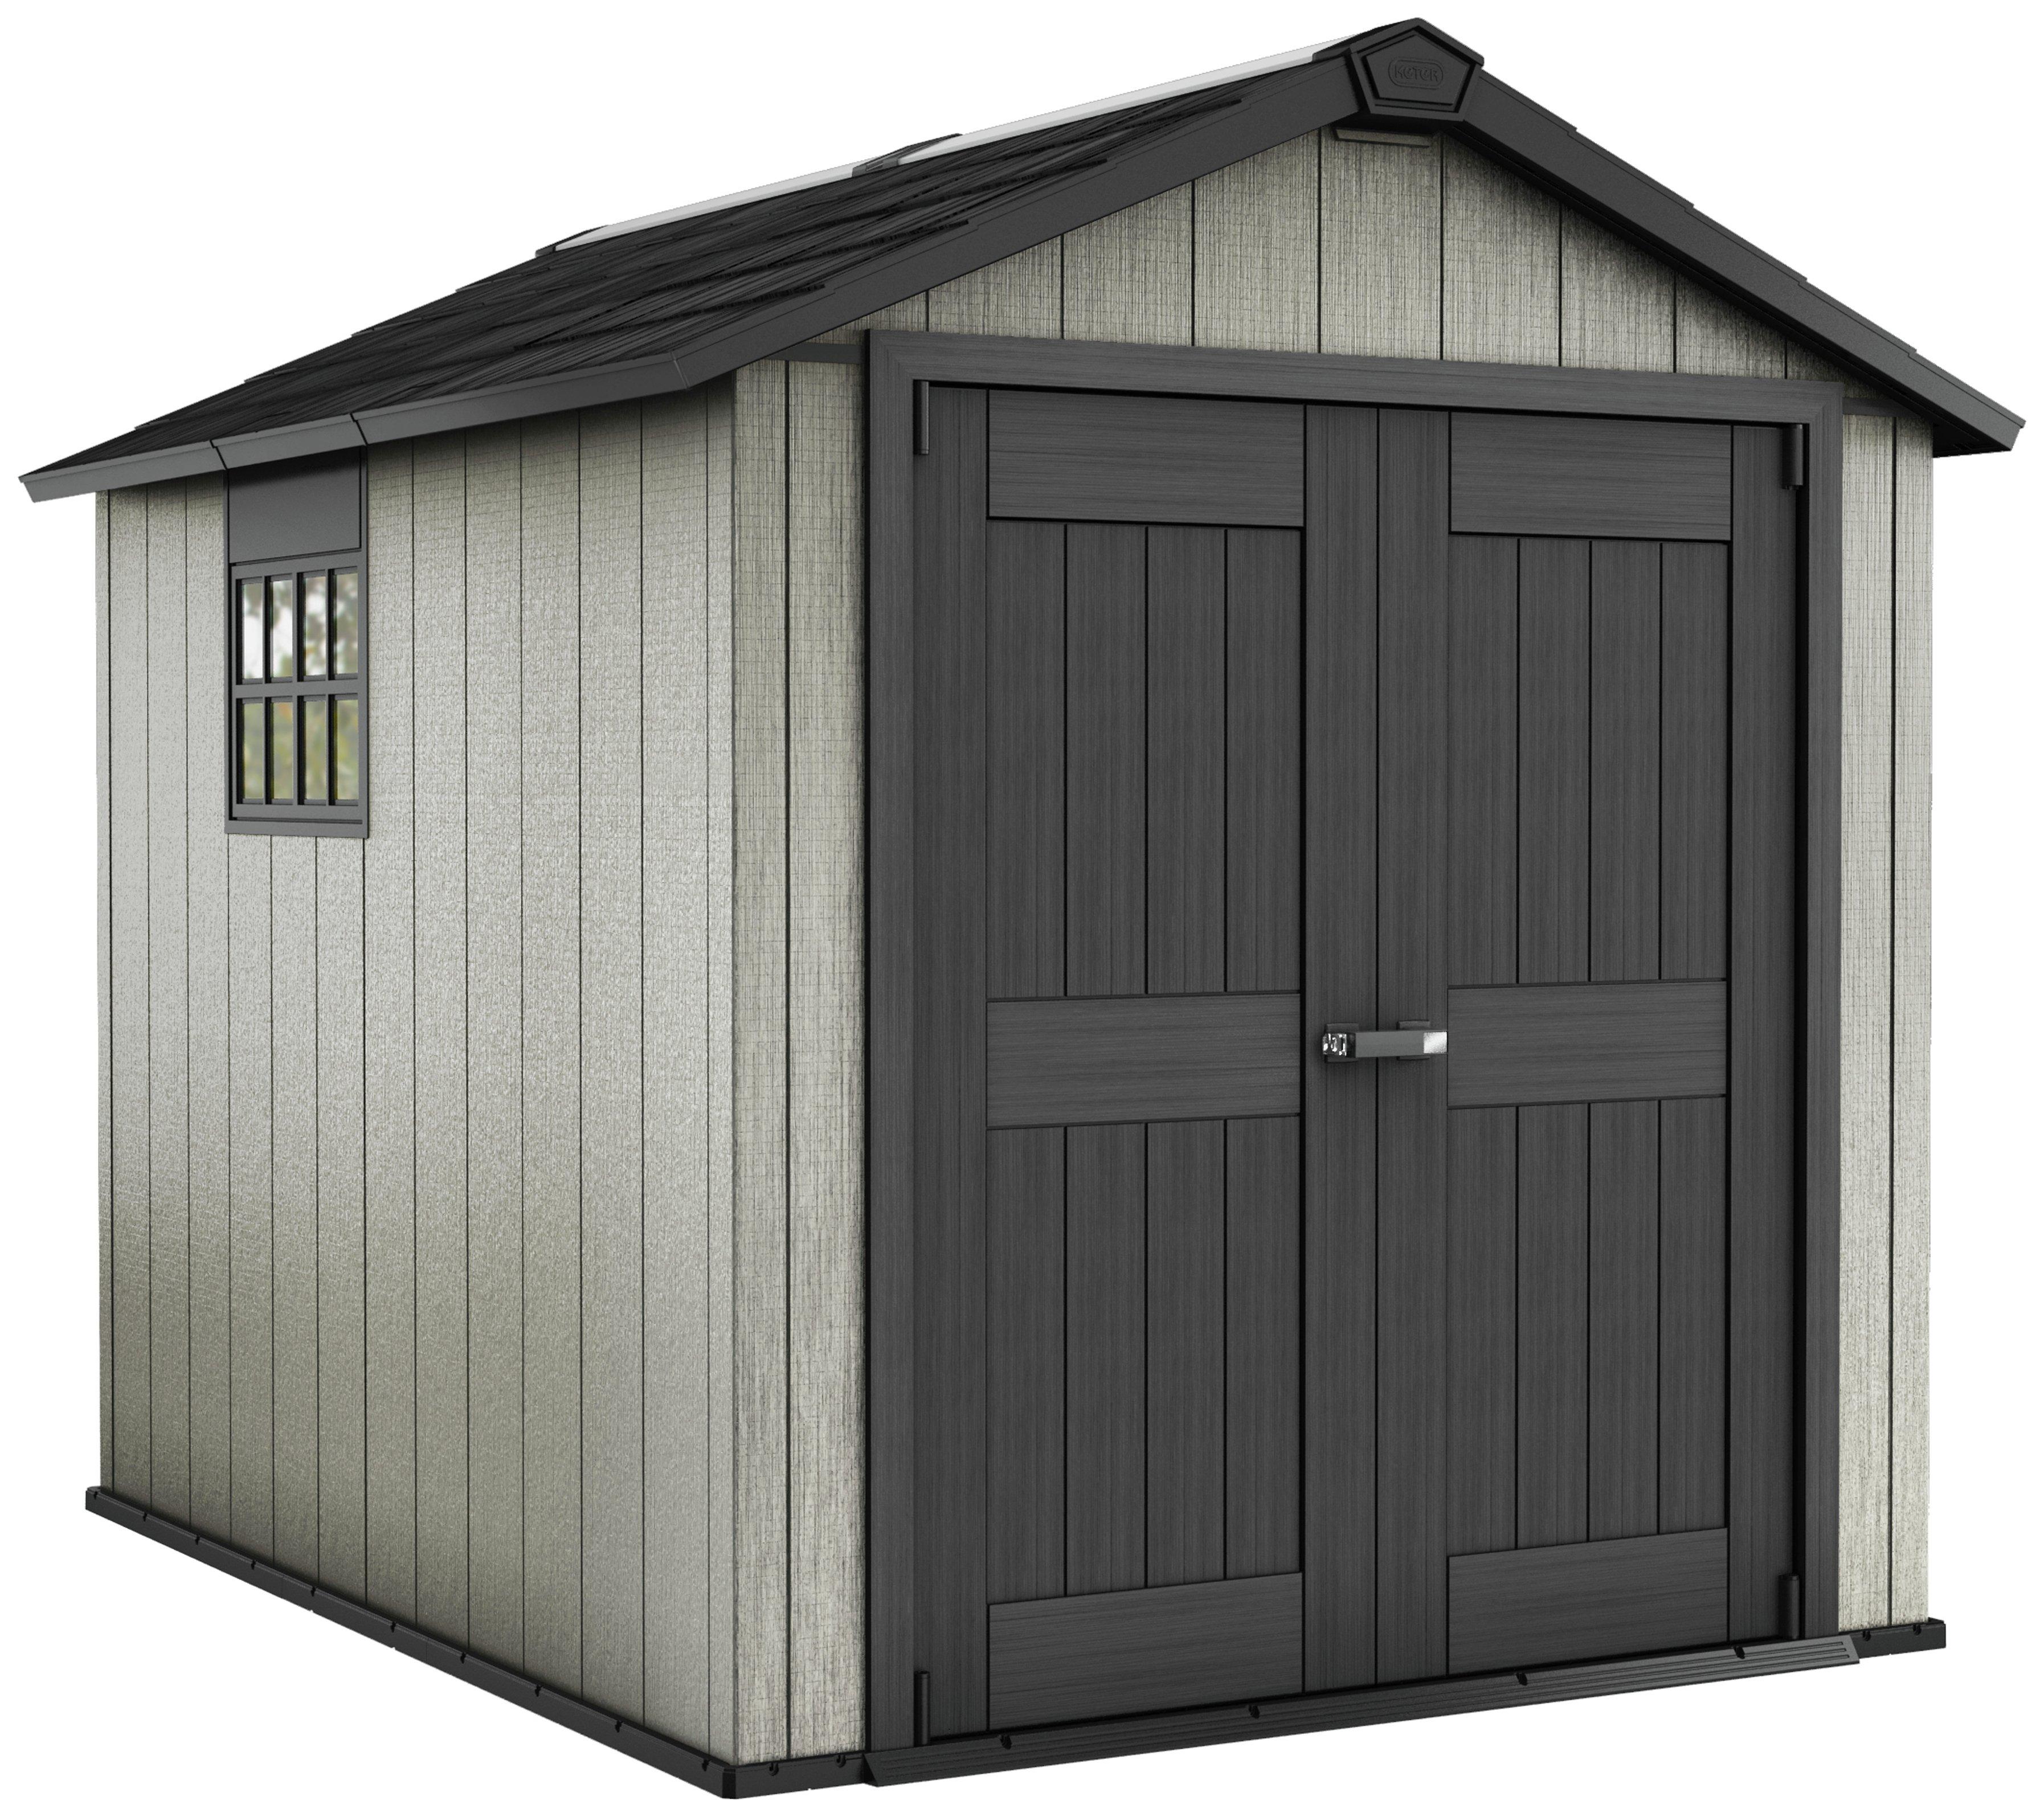 Keter oakland plastic grey brown garden shed 7 5 x 9ft - Brown plastic garden sheds ...